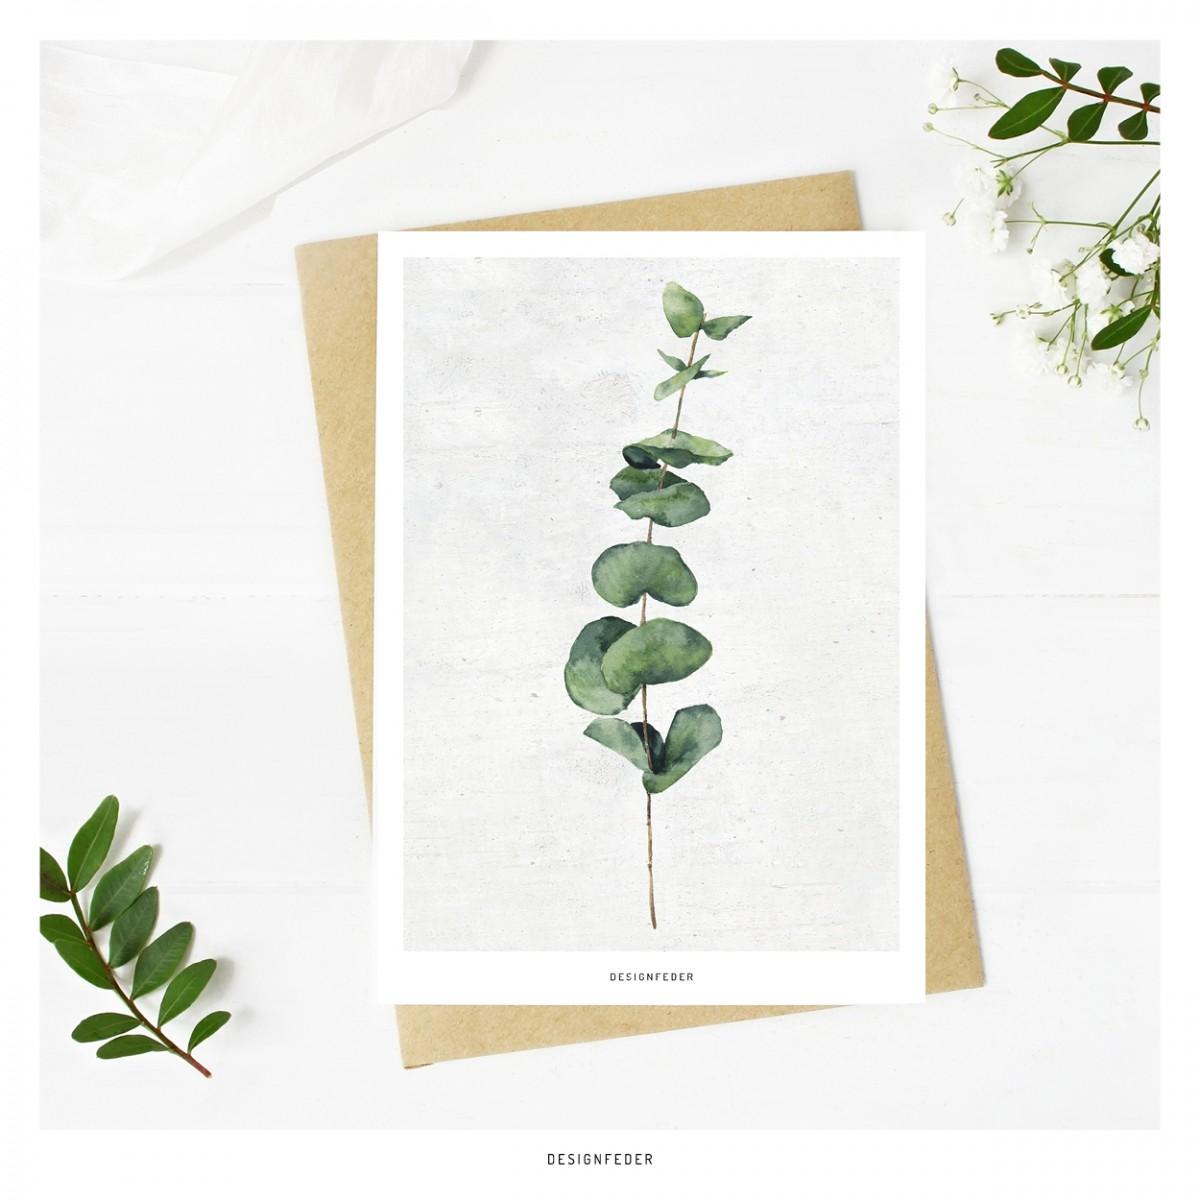 designfeder | Postkarte Pflanze Urban Jungle